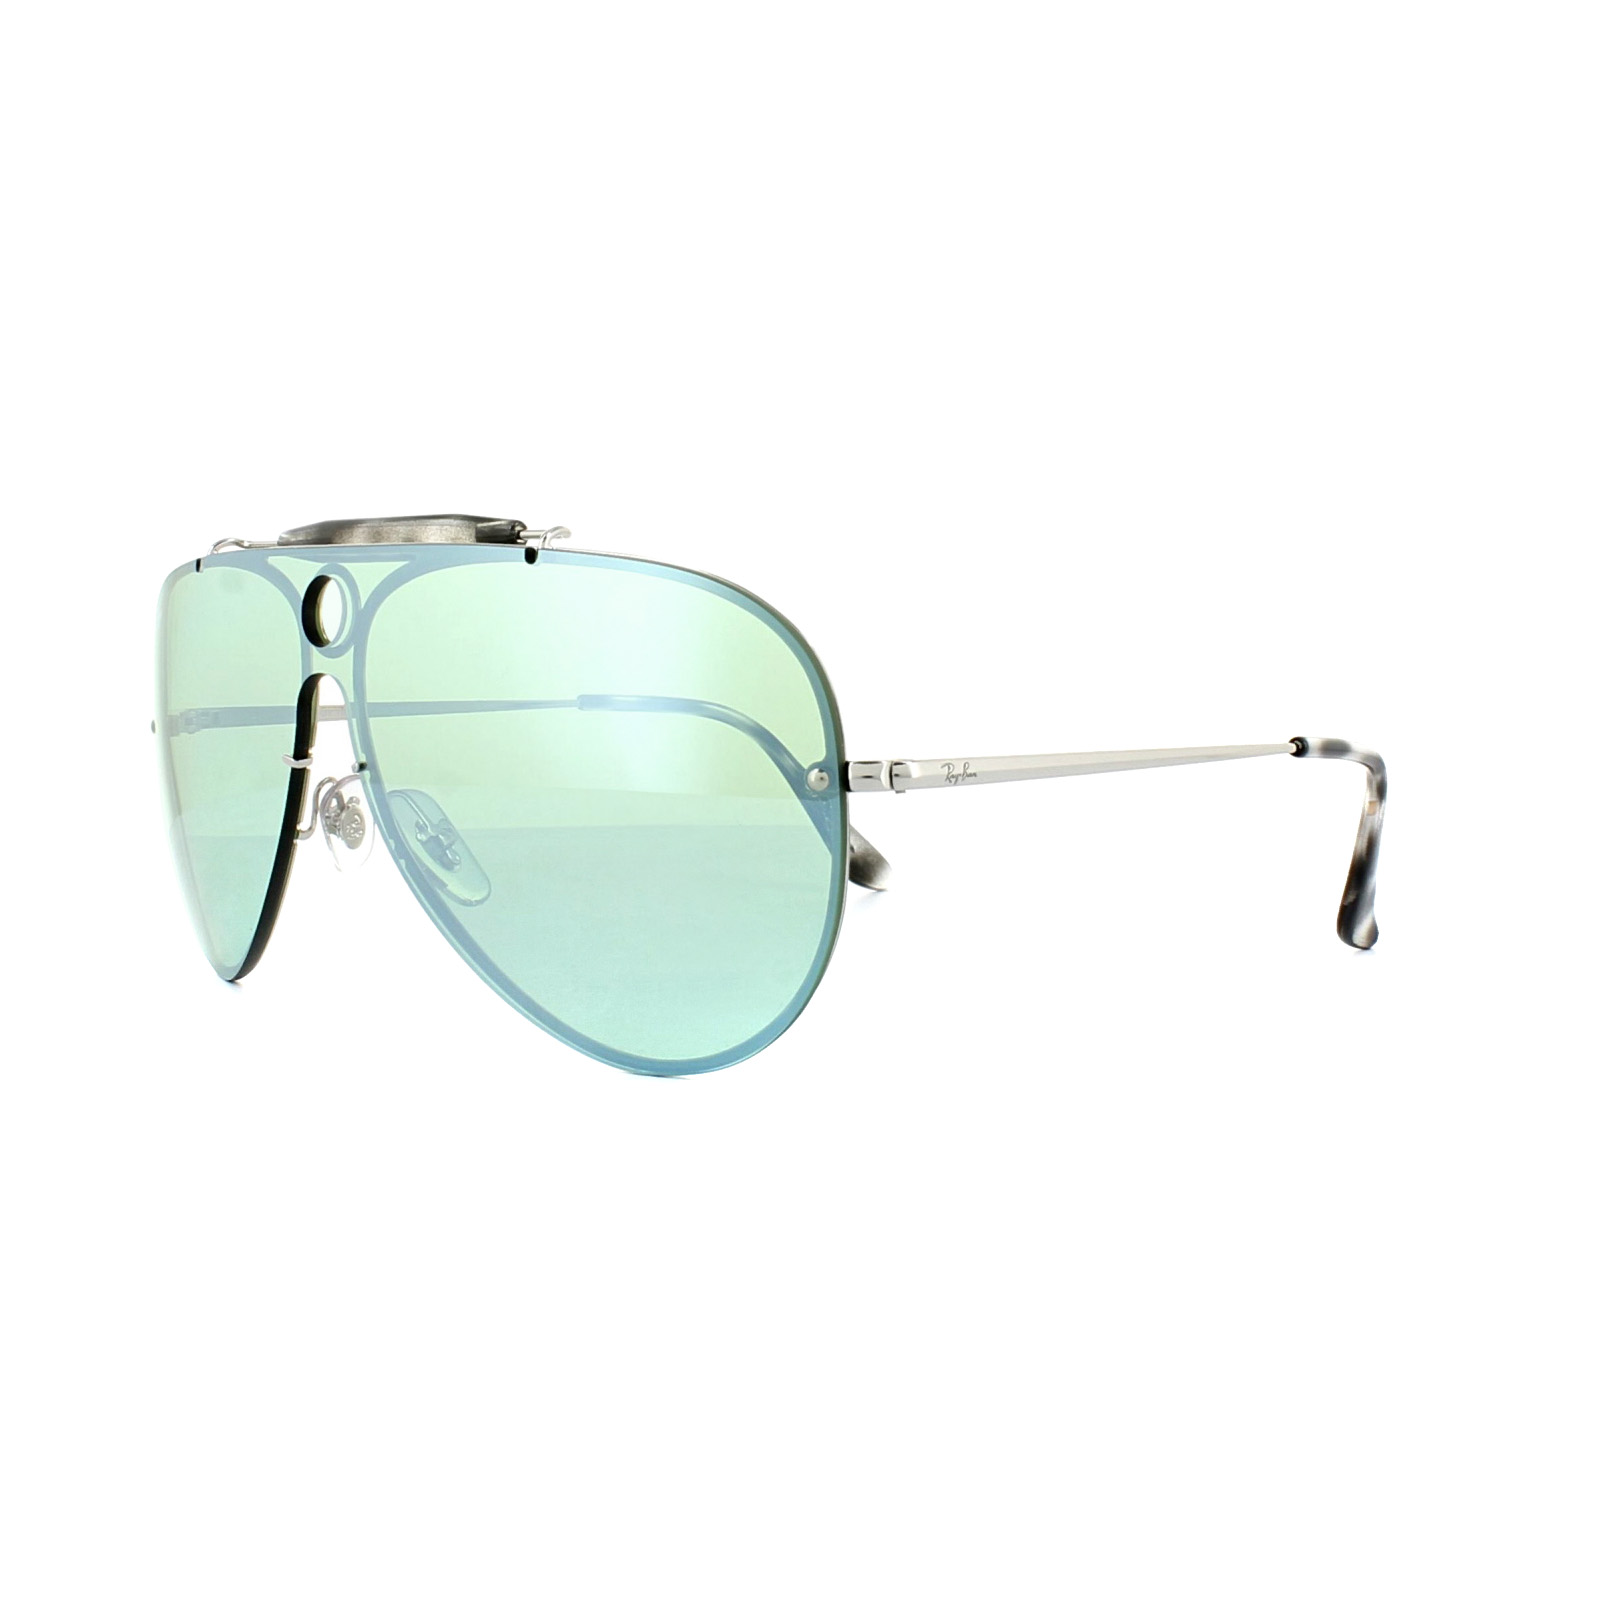 4bbdf09ee1697 Sentinel Ray-Ban Sunglasses Blaze Shooter 3581N 003 30 Silver Dark Green  Silver Mirror